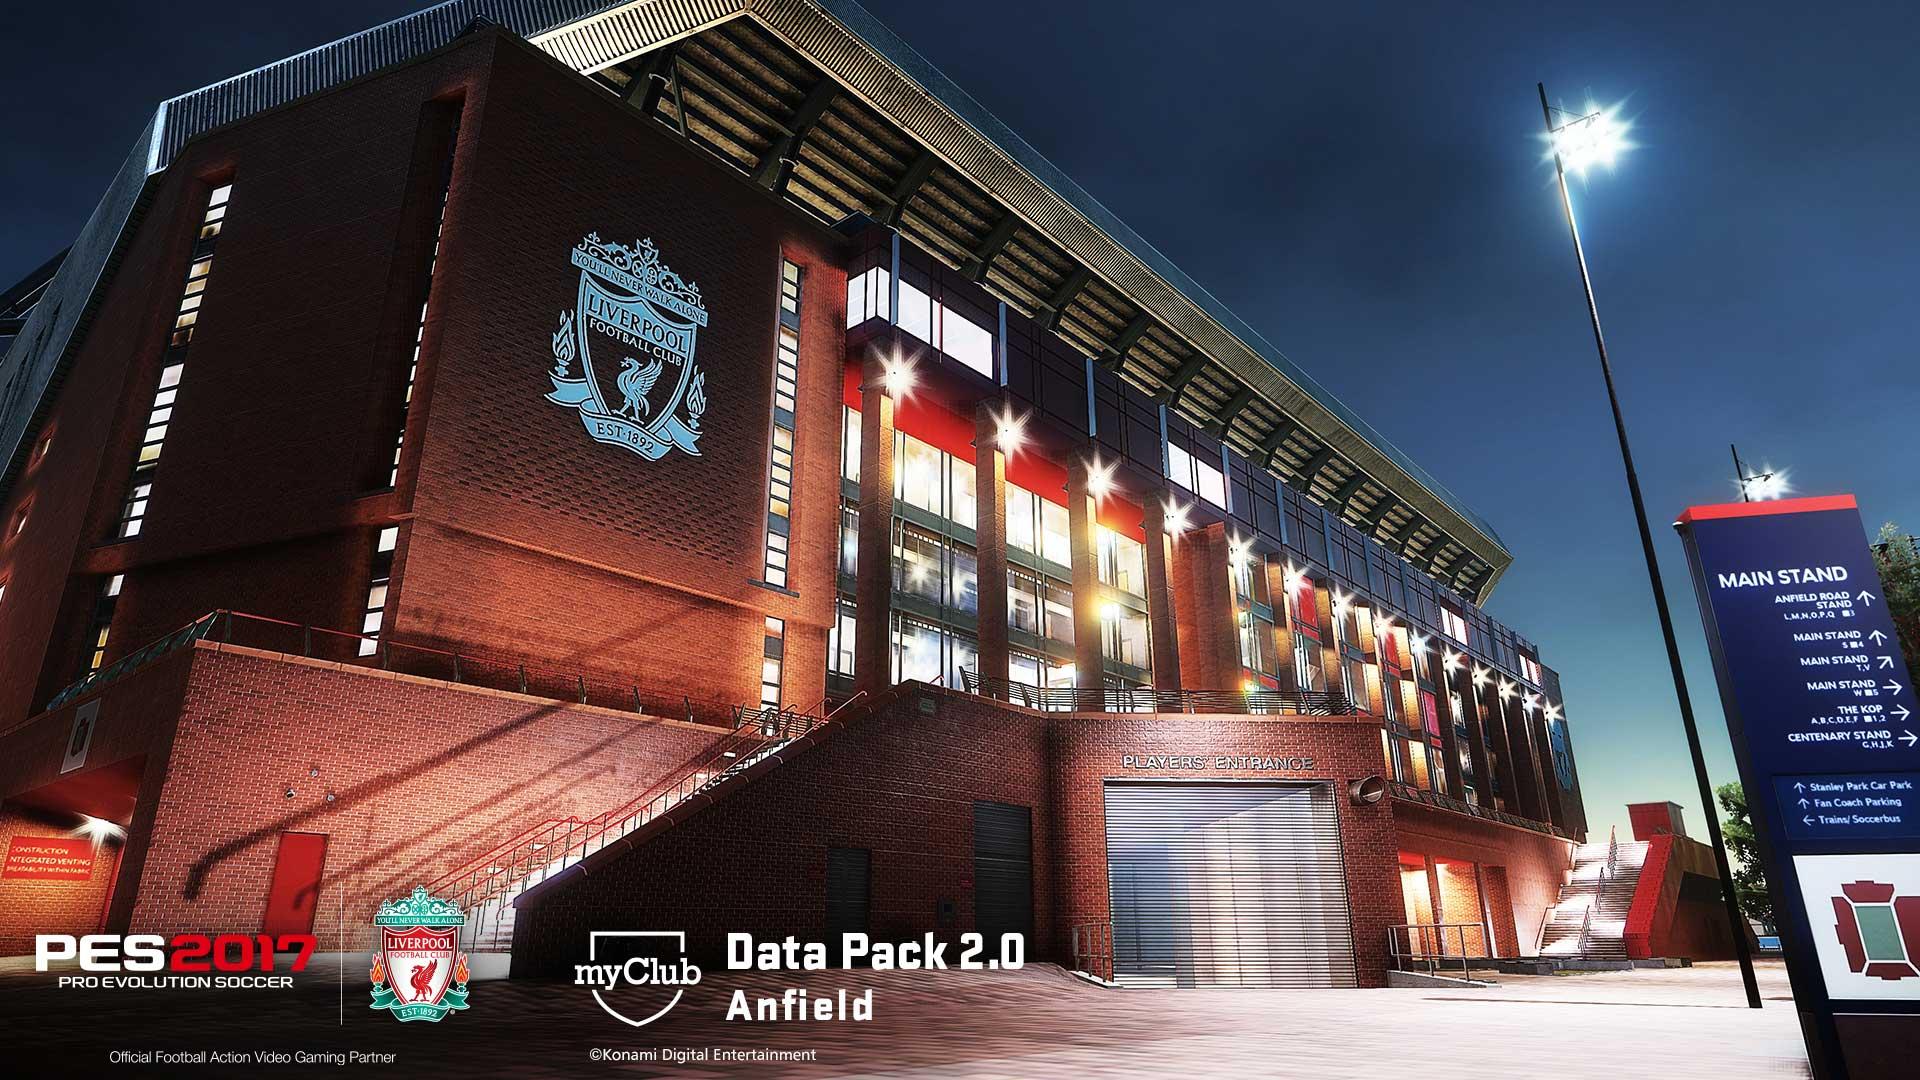 Data Pack 2.0 - Liverpool Stadium Anfield